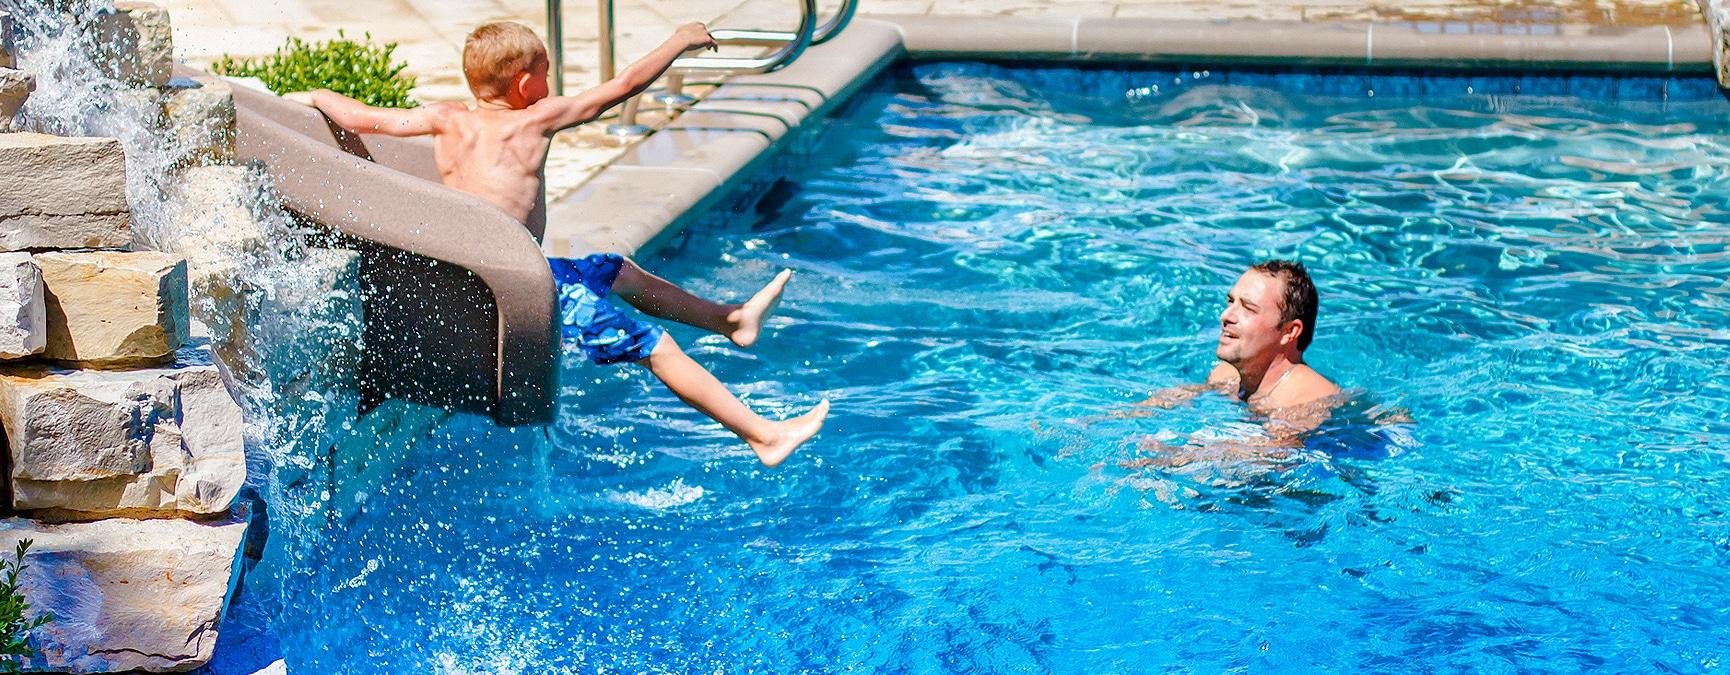 pools-play